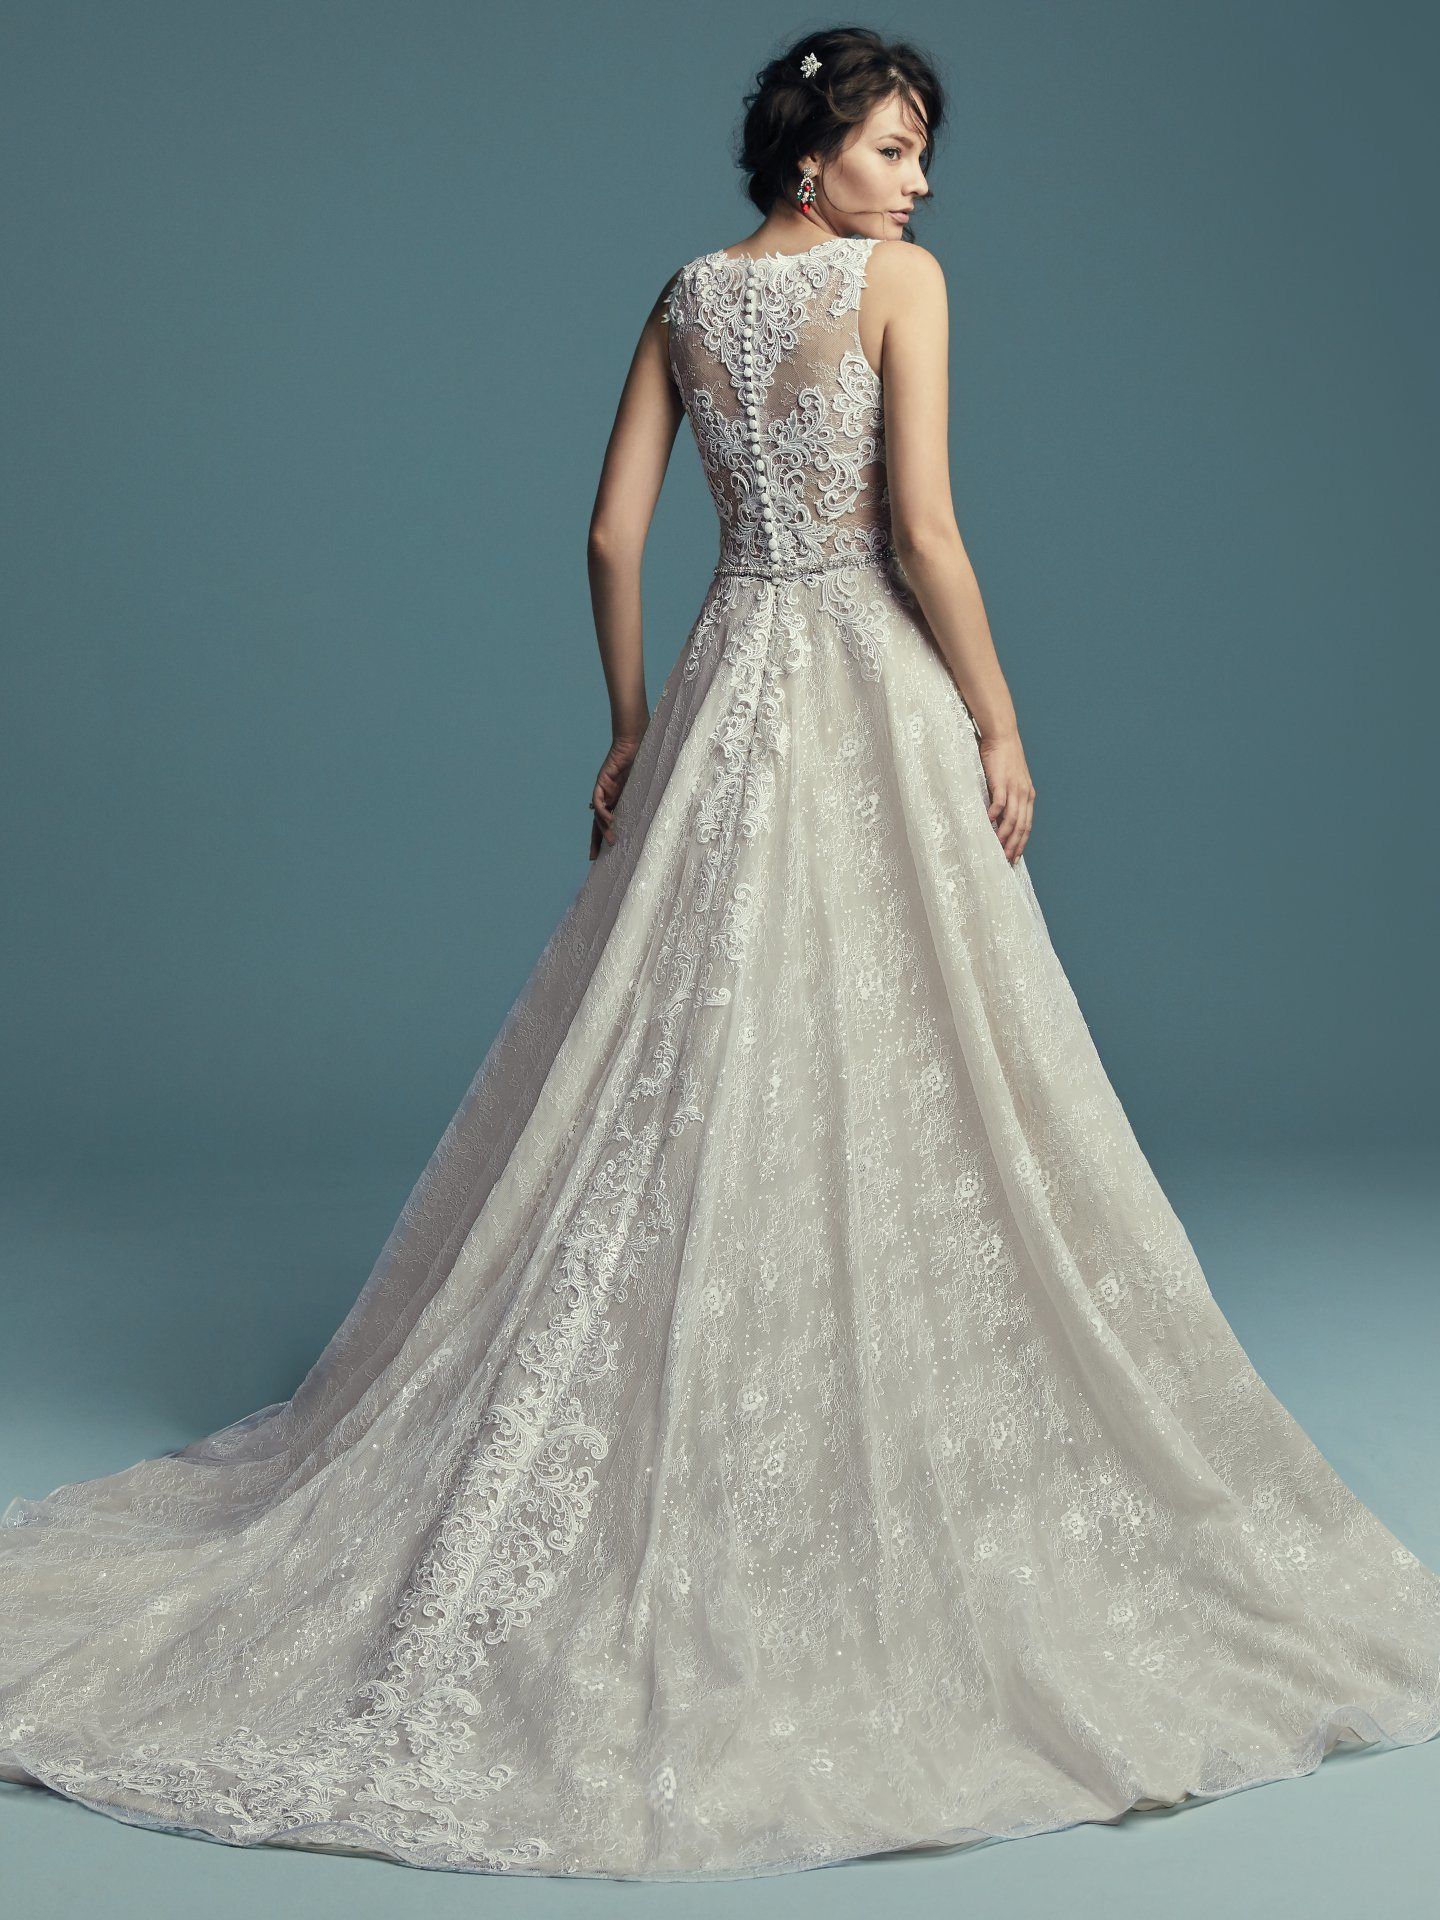 China 2019 Lace Wedding Dress A Line Sleeveless Bridal Wedding Gown